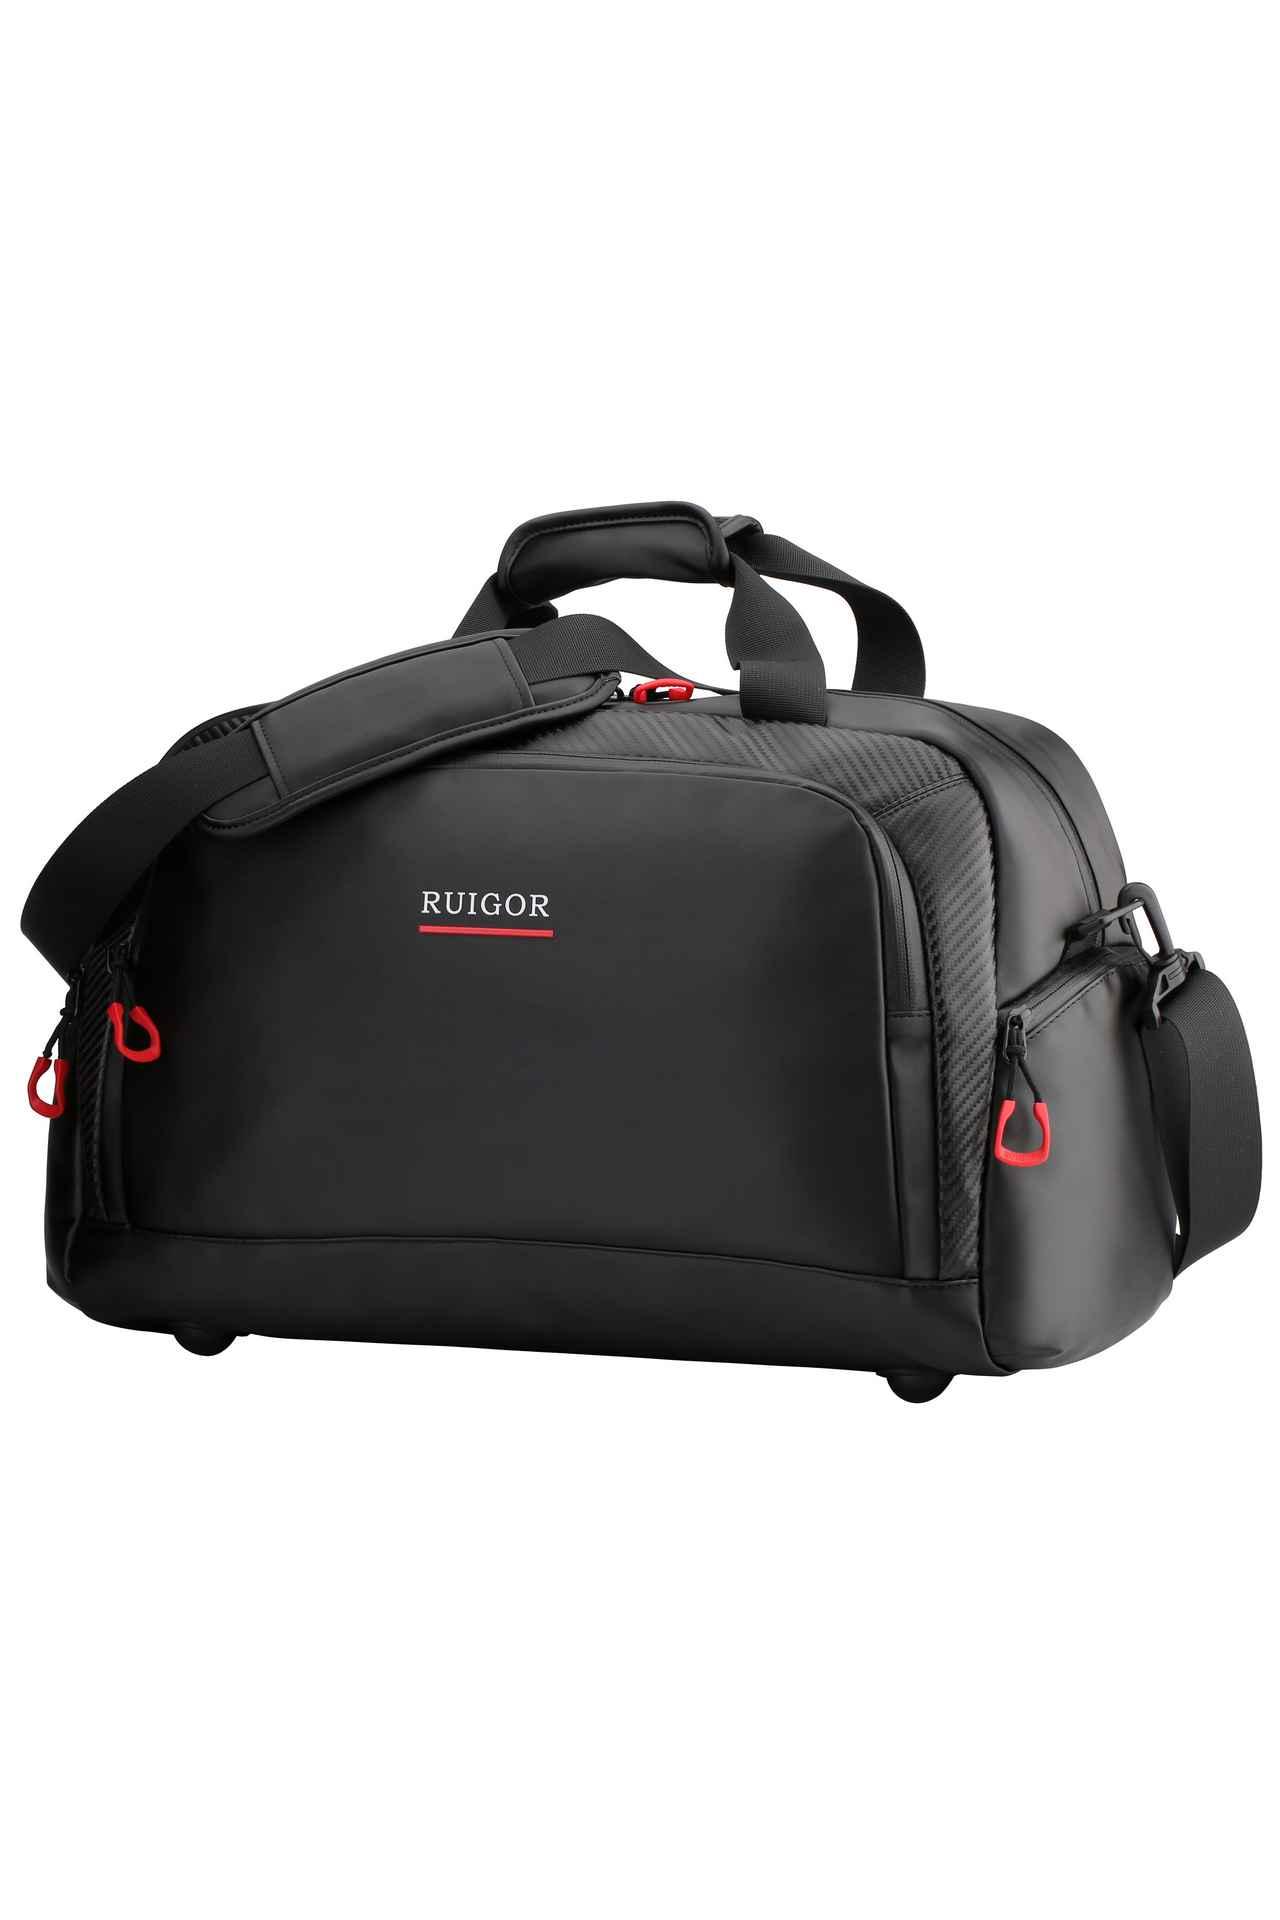 RUIGOR MOTION 01 Duffelbag Black